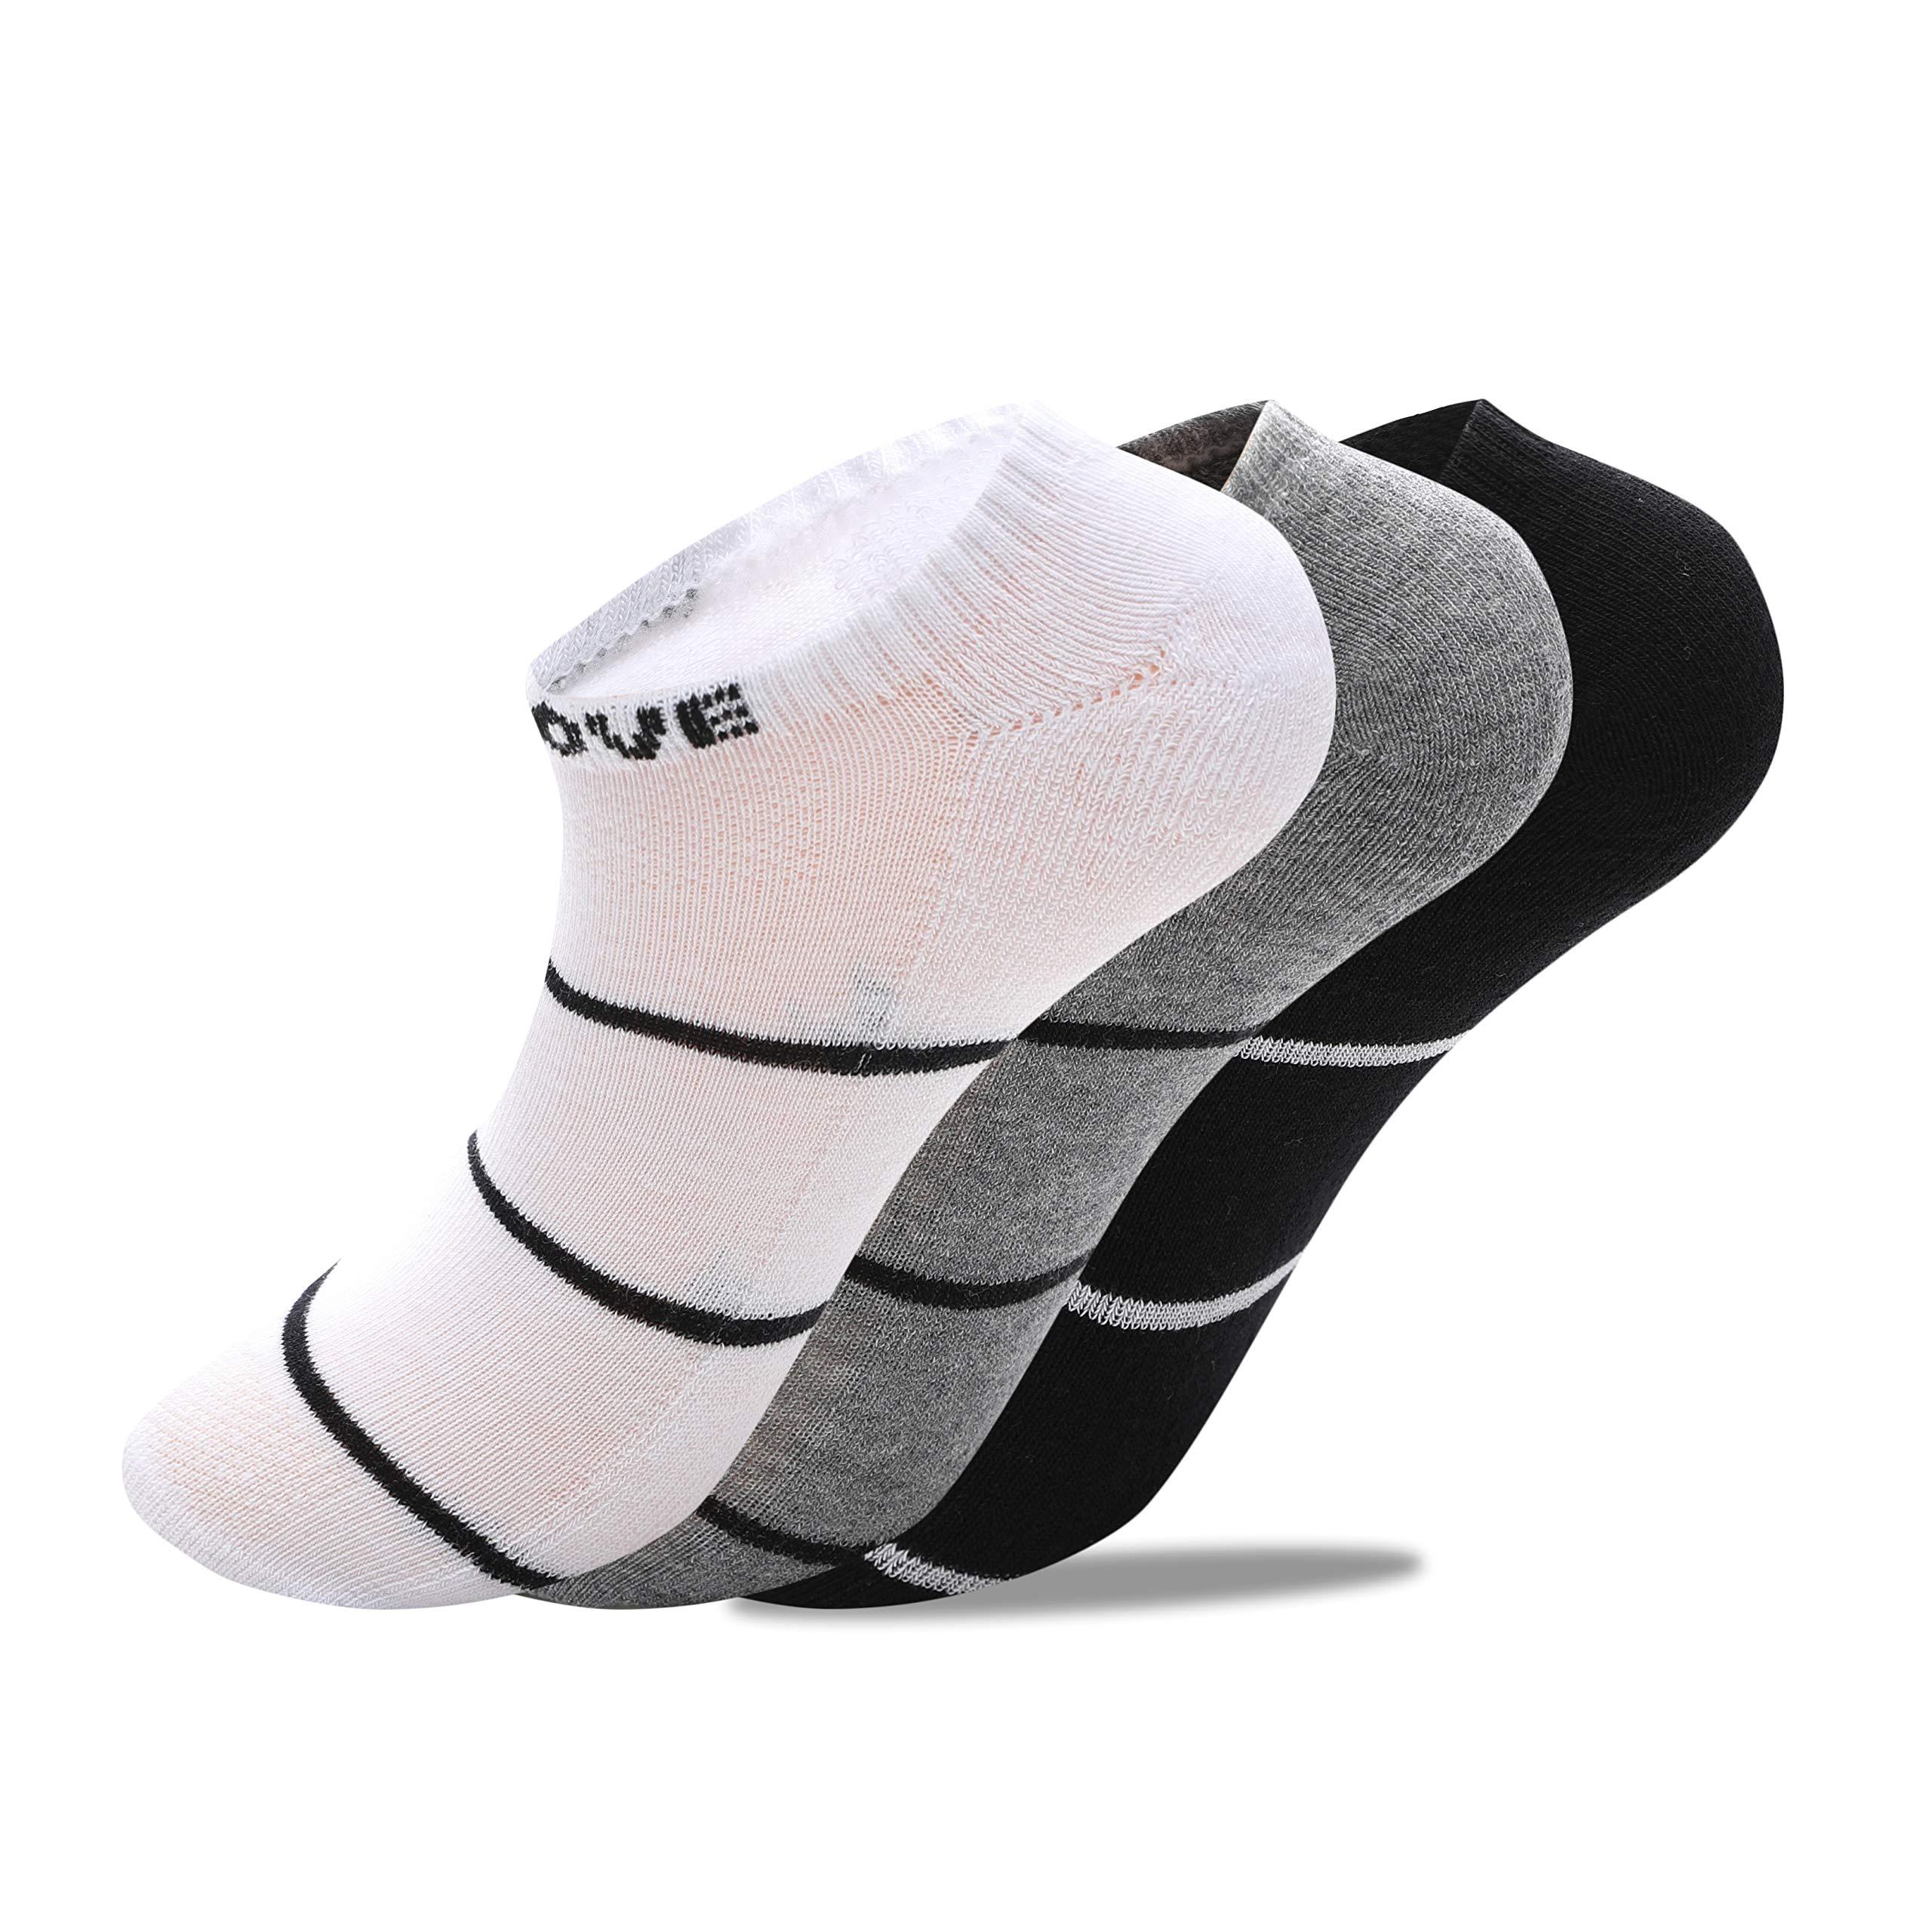 RuRu Monkey Low Cut Athletic Socks for Women & Men (3 Pair)